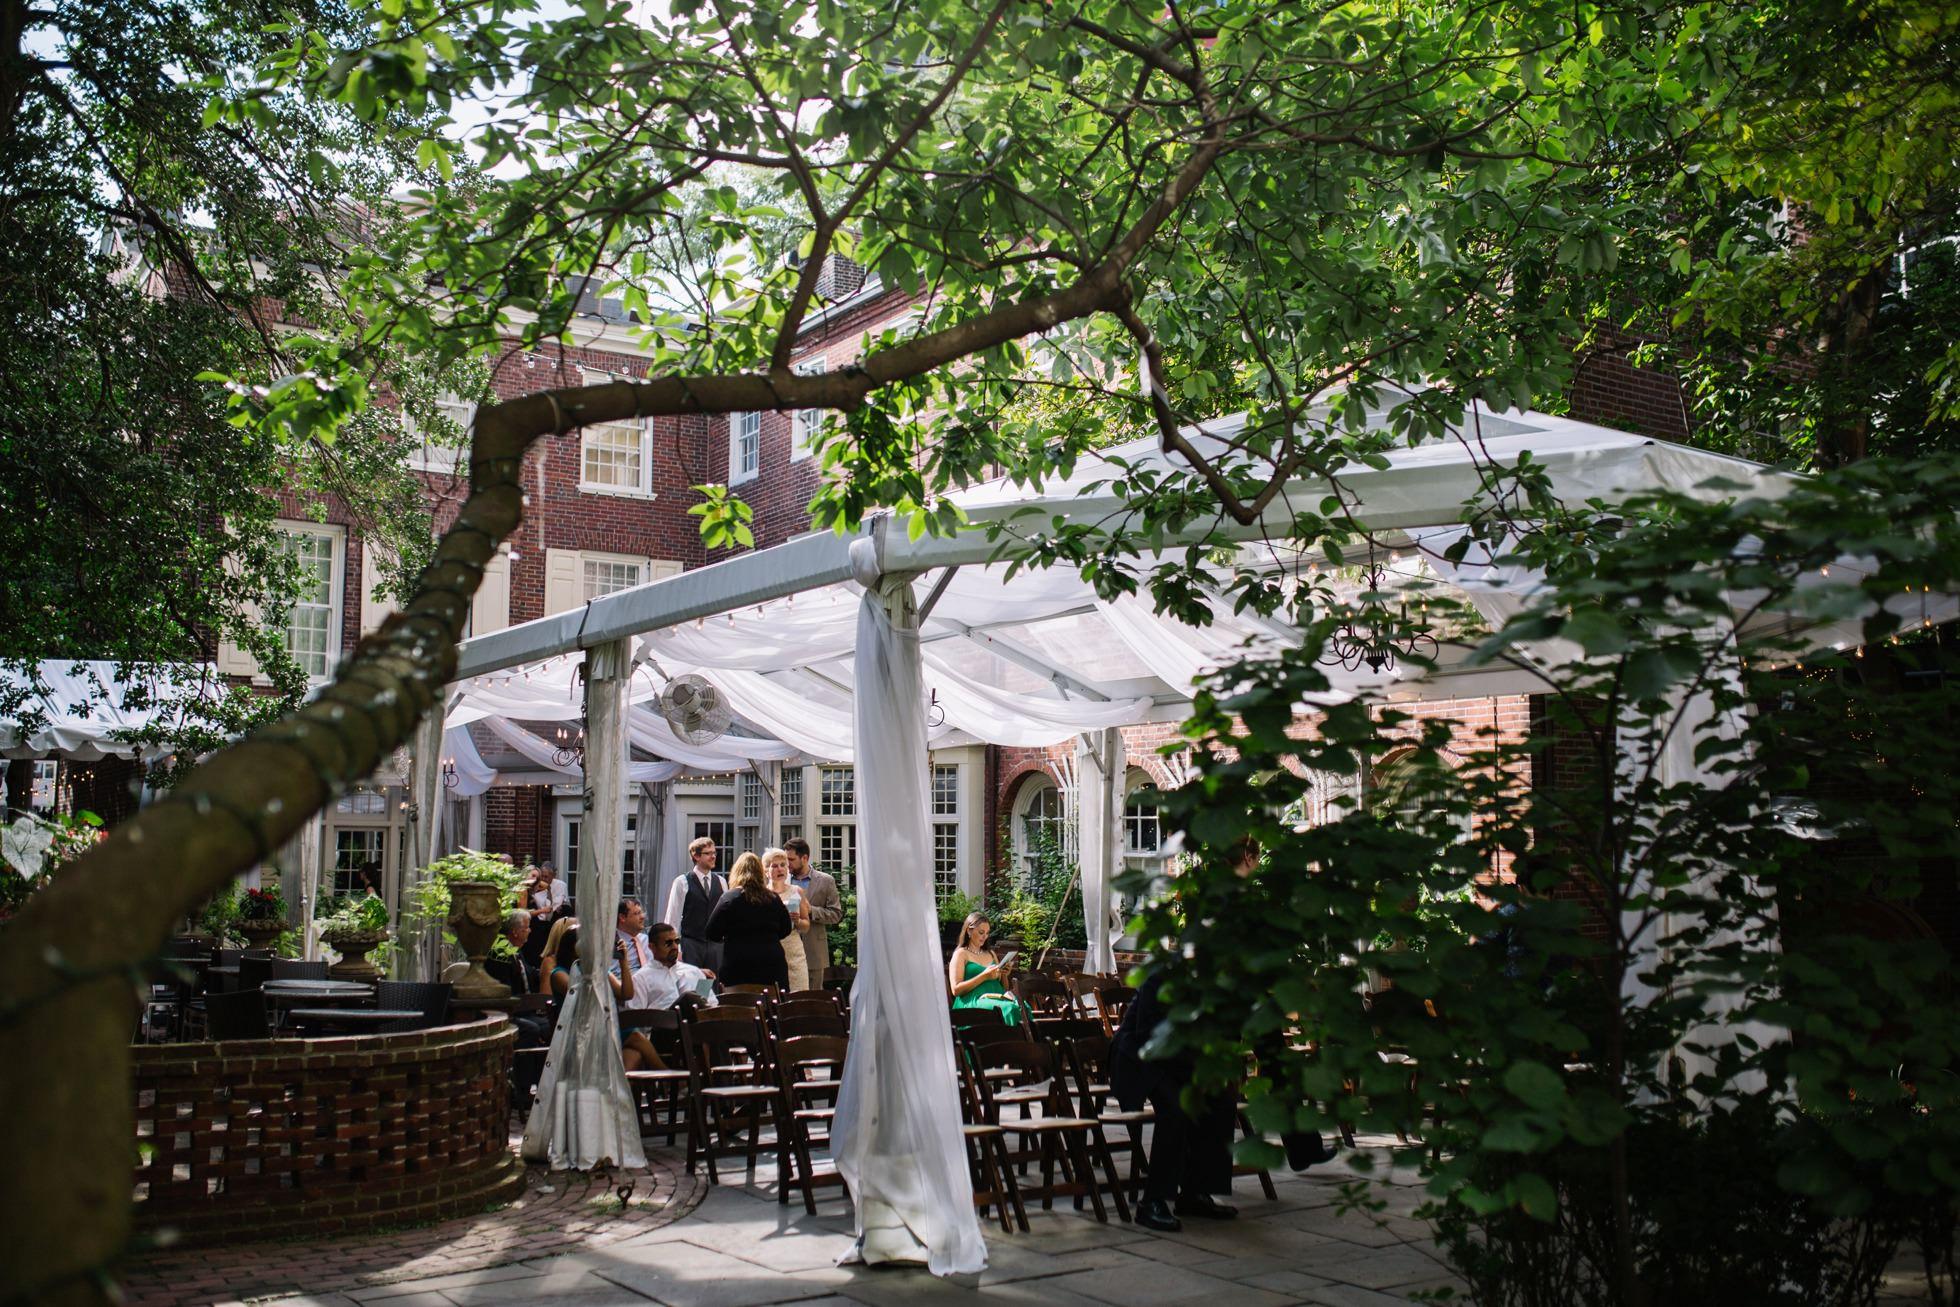 Best Unique PA NY NJ Wedding Venues - Philadelphia Morris House Hotel